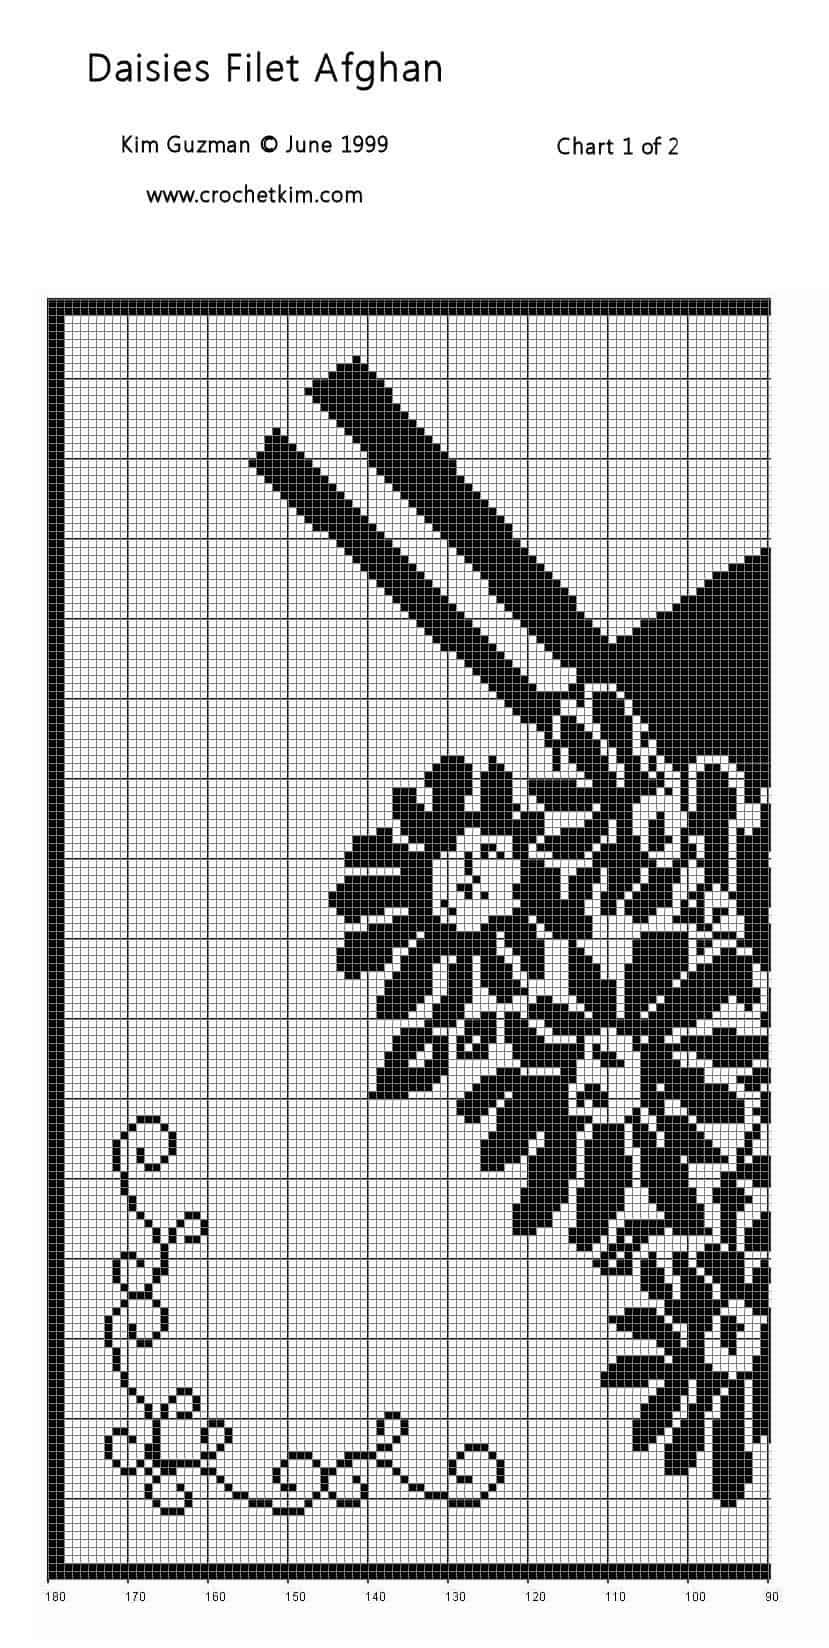 Daisies Filet Crochet Chart | free crochet pattern @crochetkim